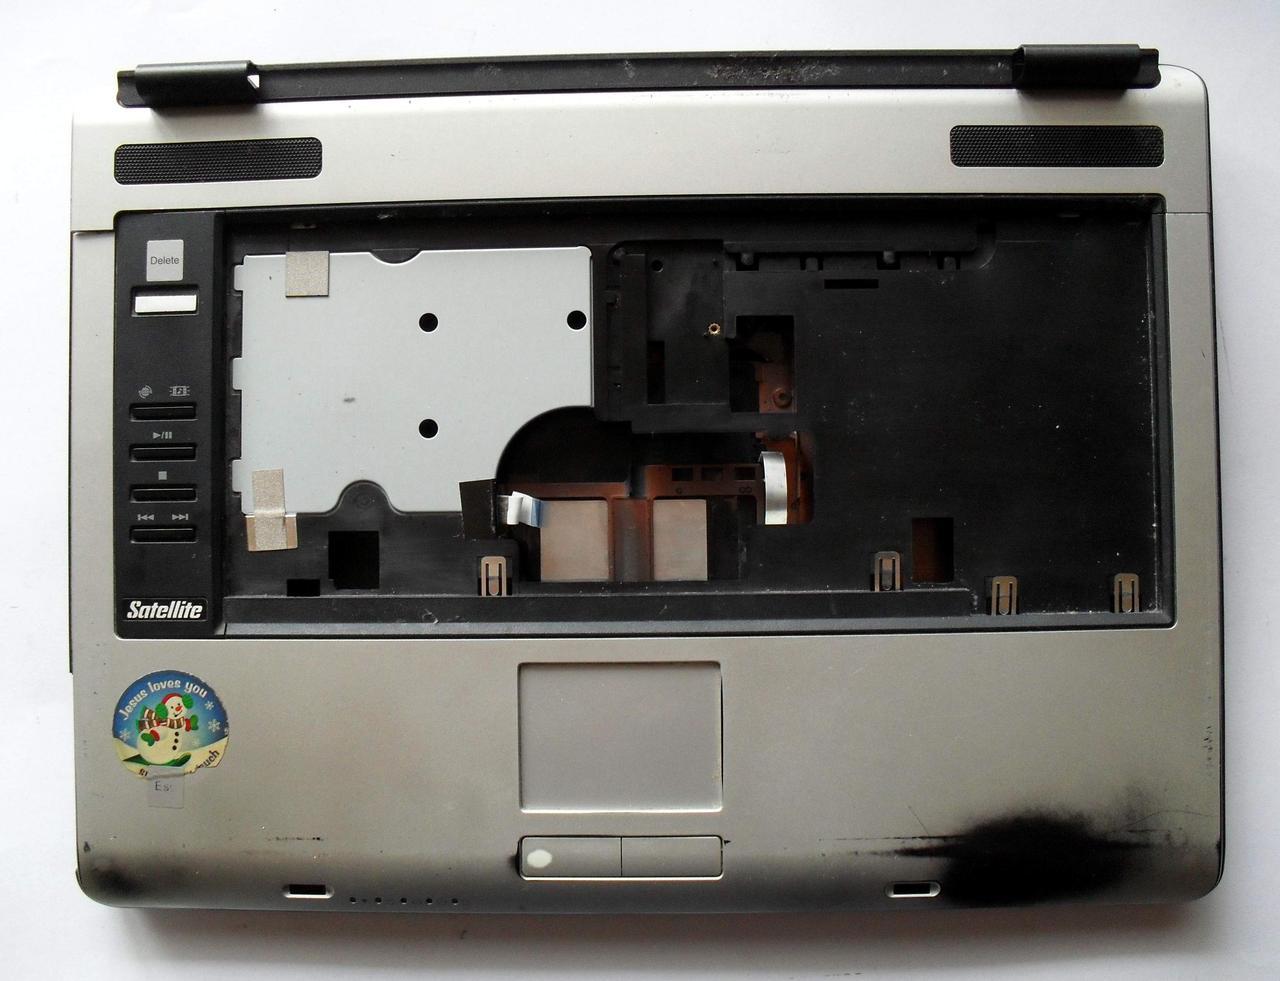 274 Корпус Toshiba A105 - две половины нижней части и тачпад